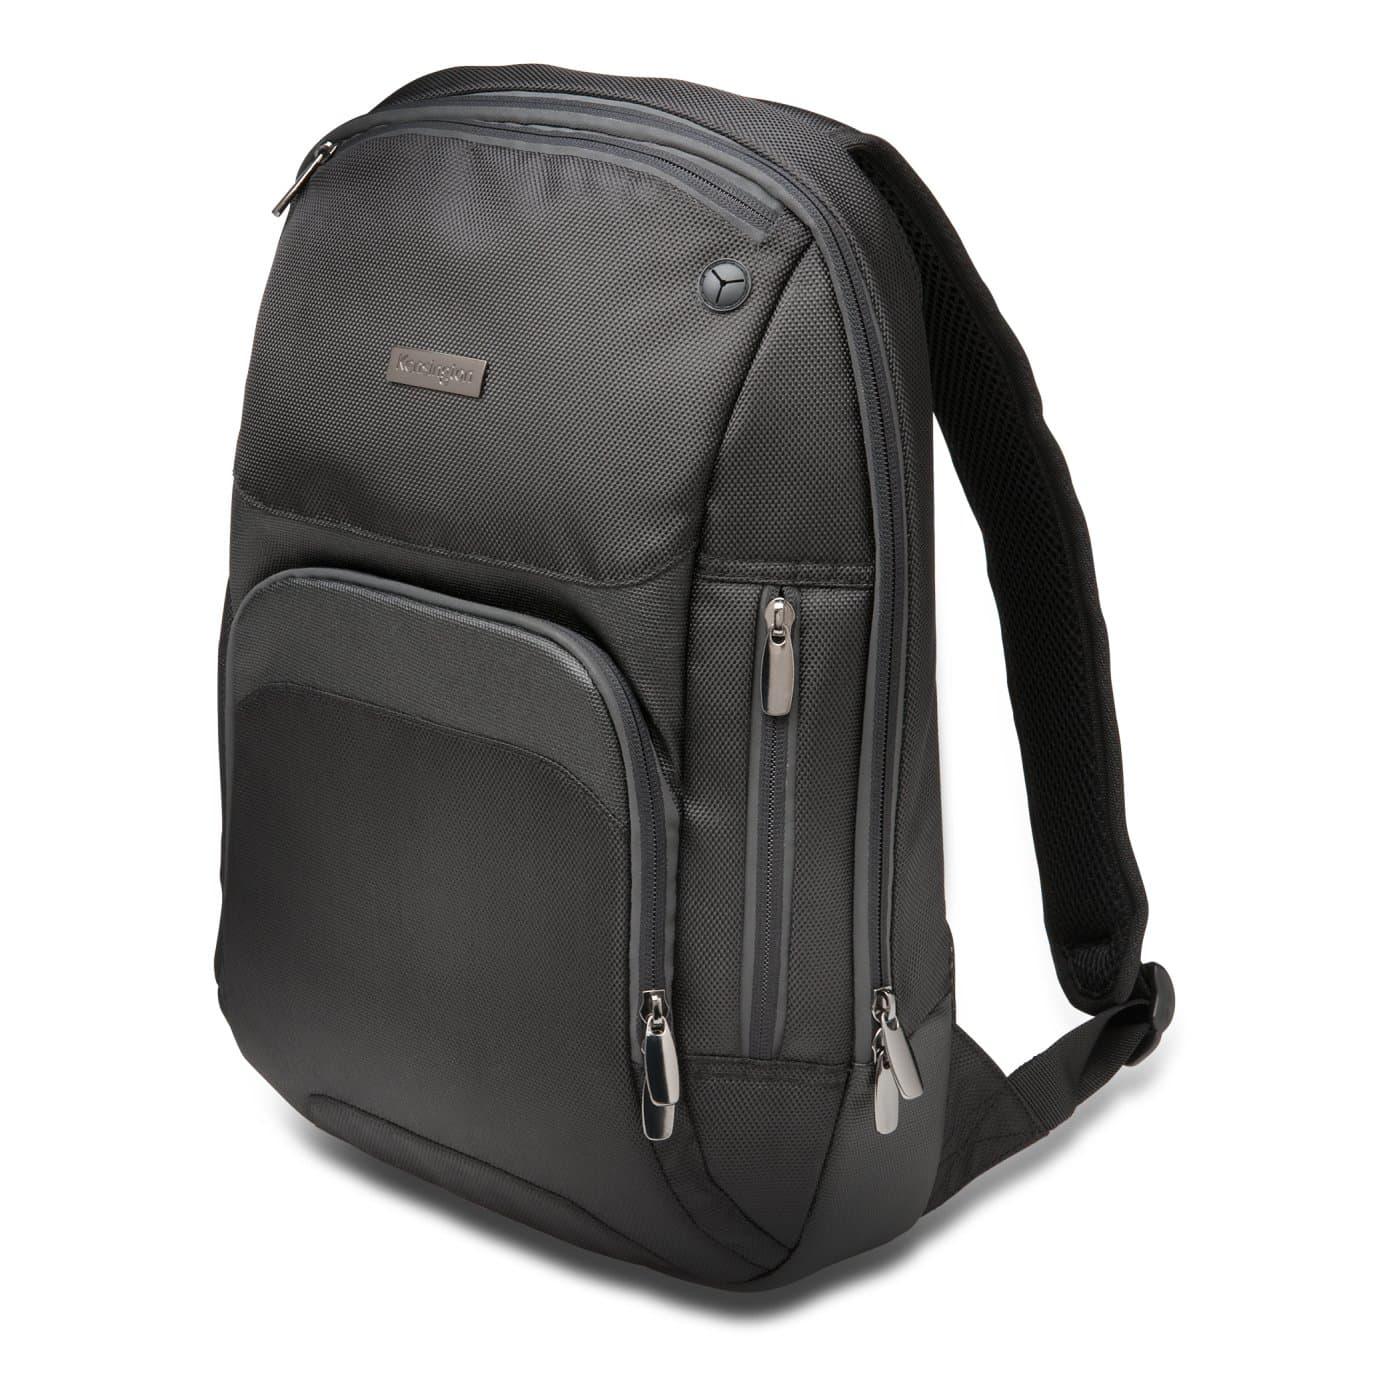 Kensington - Products - Laptop Bags - Triple Trek™ Ultrabook ...